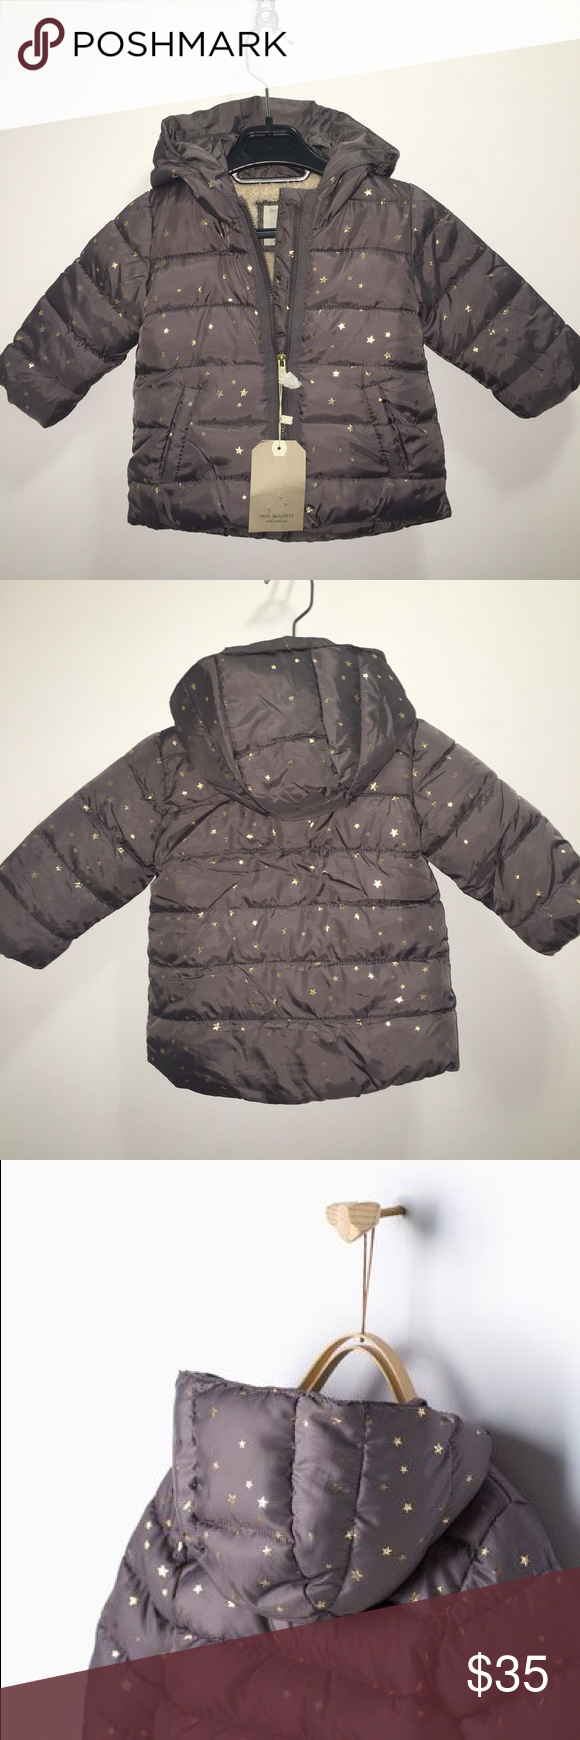 747264fef Zara Baby Girl Puffer Jacket NWT